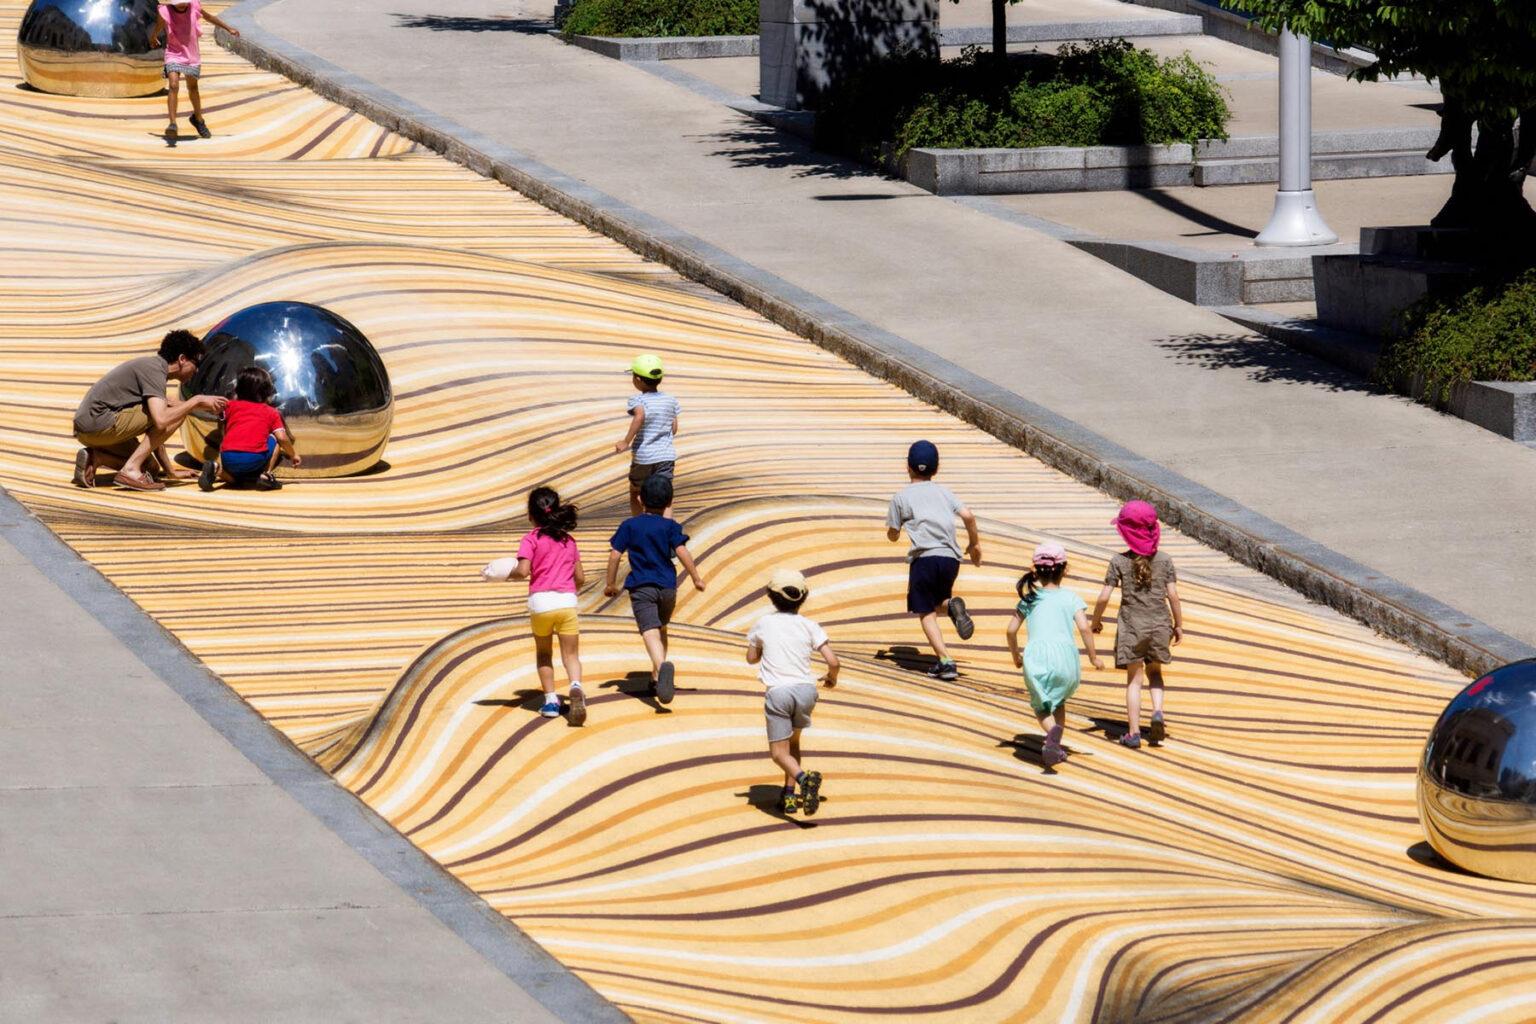 Impressive Moving Dunes Optical Illusion